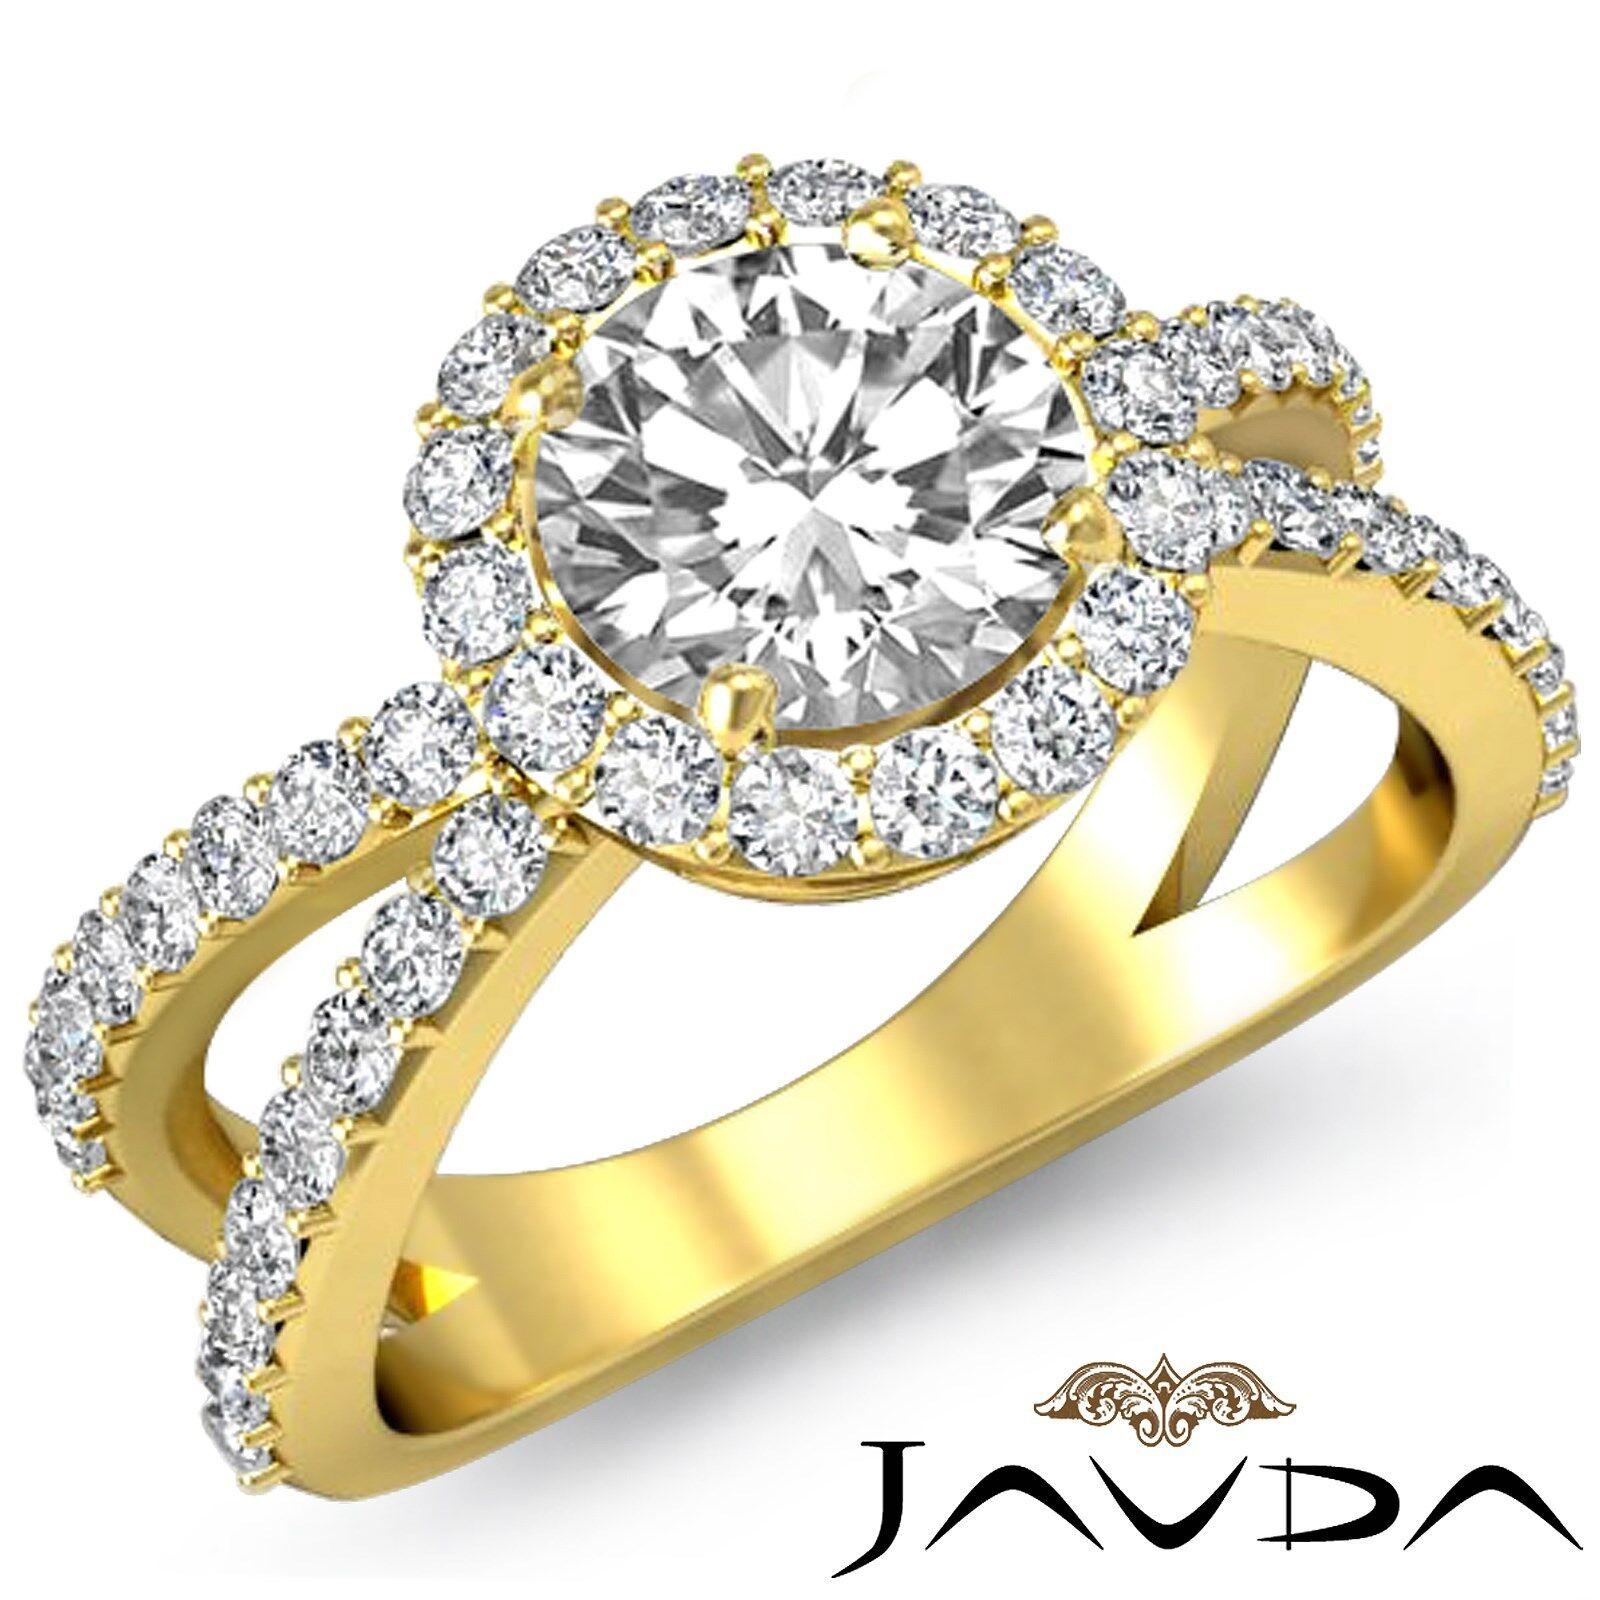 Halo Pave Round Diamond Engagement Split Shank Filigree Ring GIA G VS2 2.25 Ct